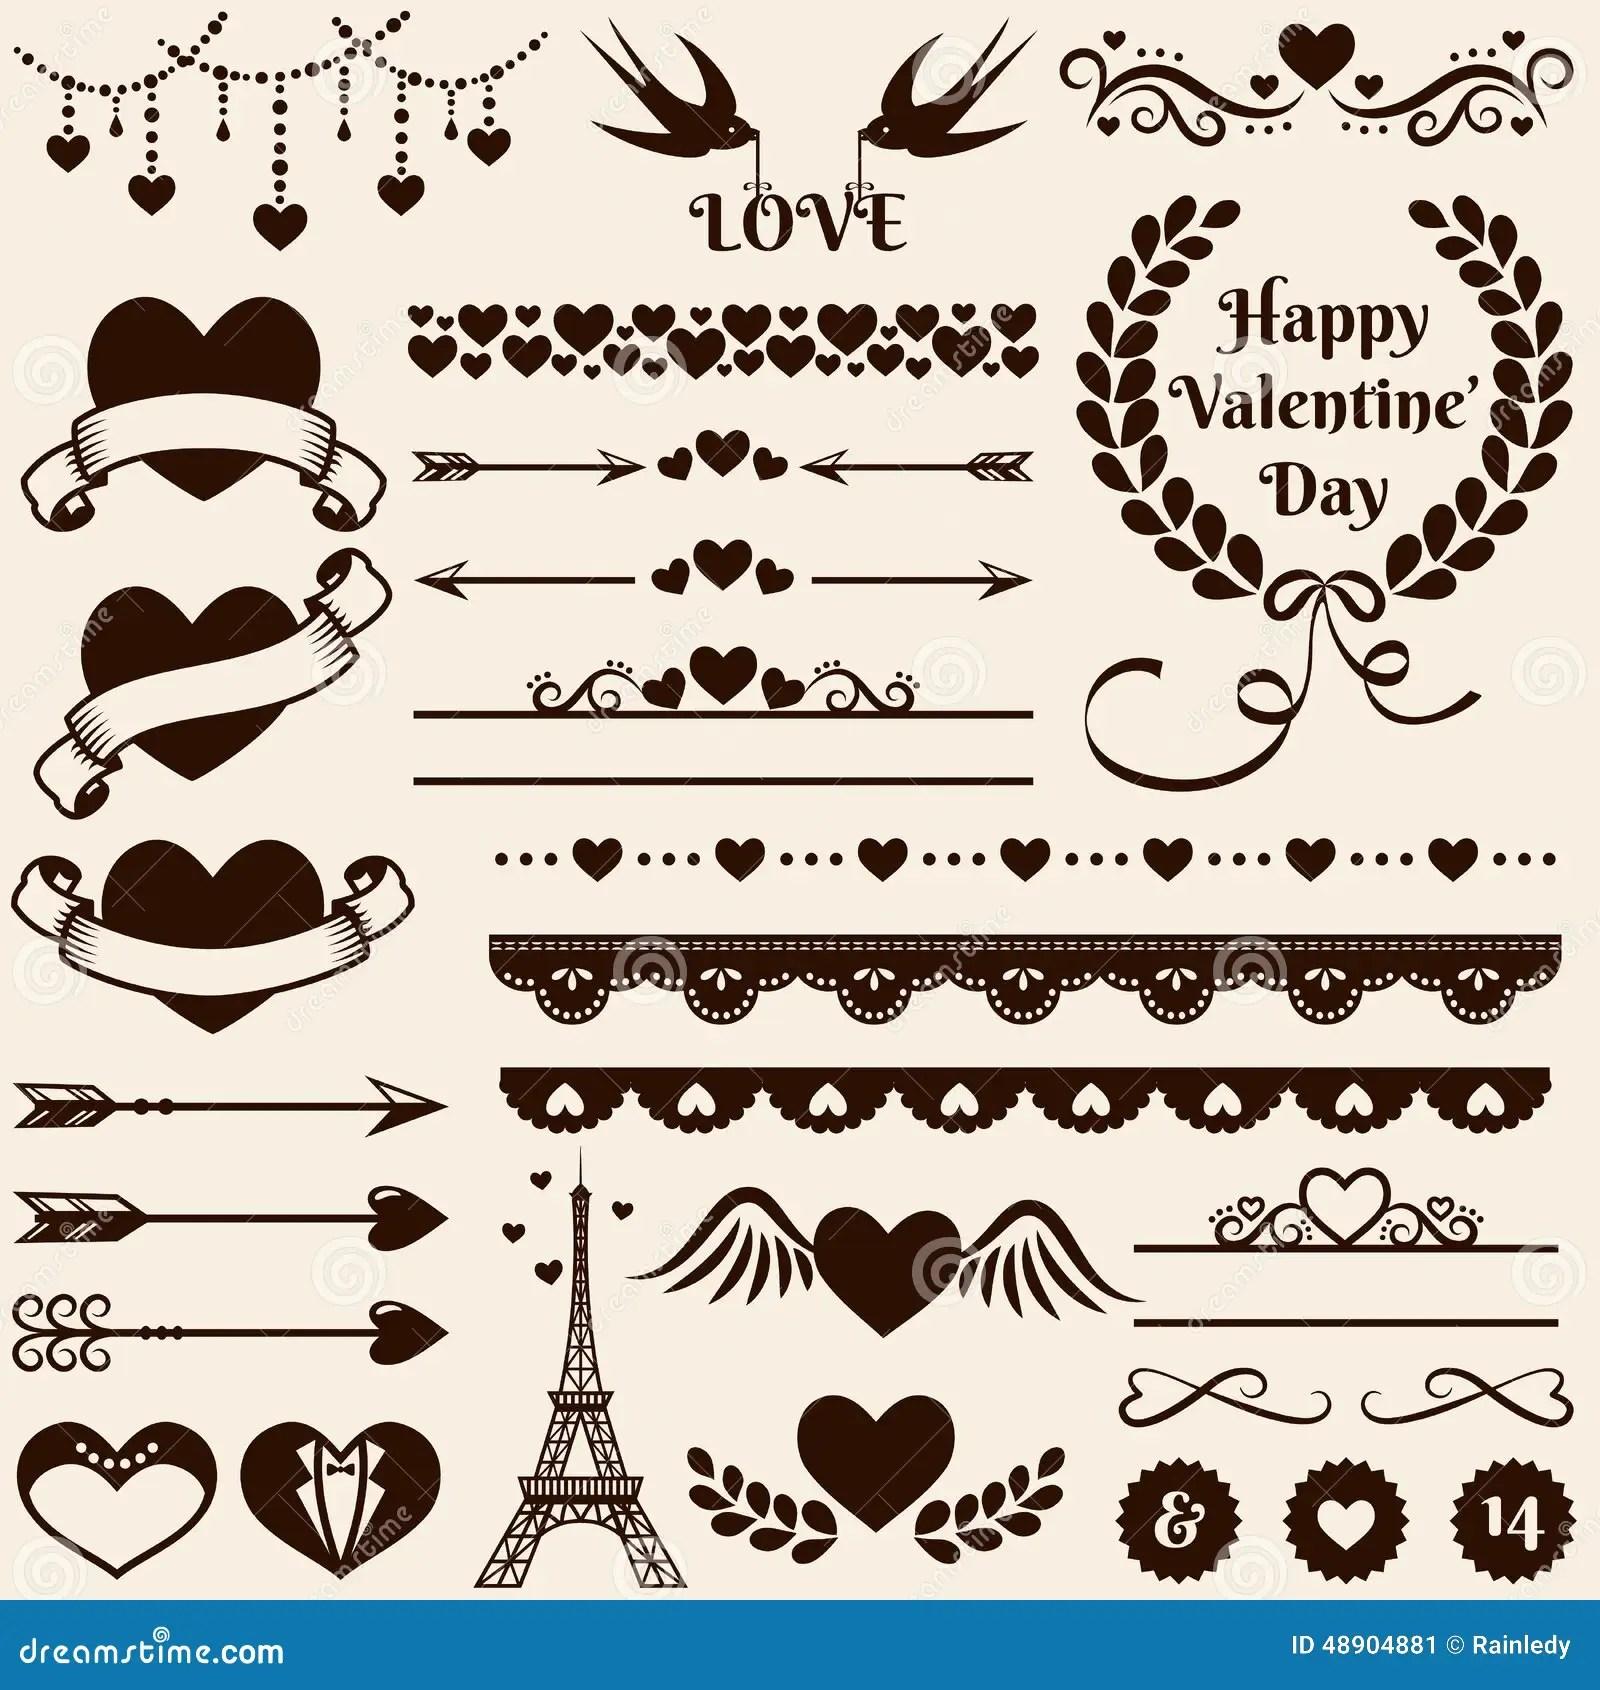 Image Result For Wedding Invitation Heart Design